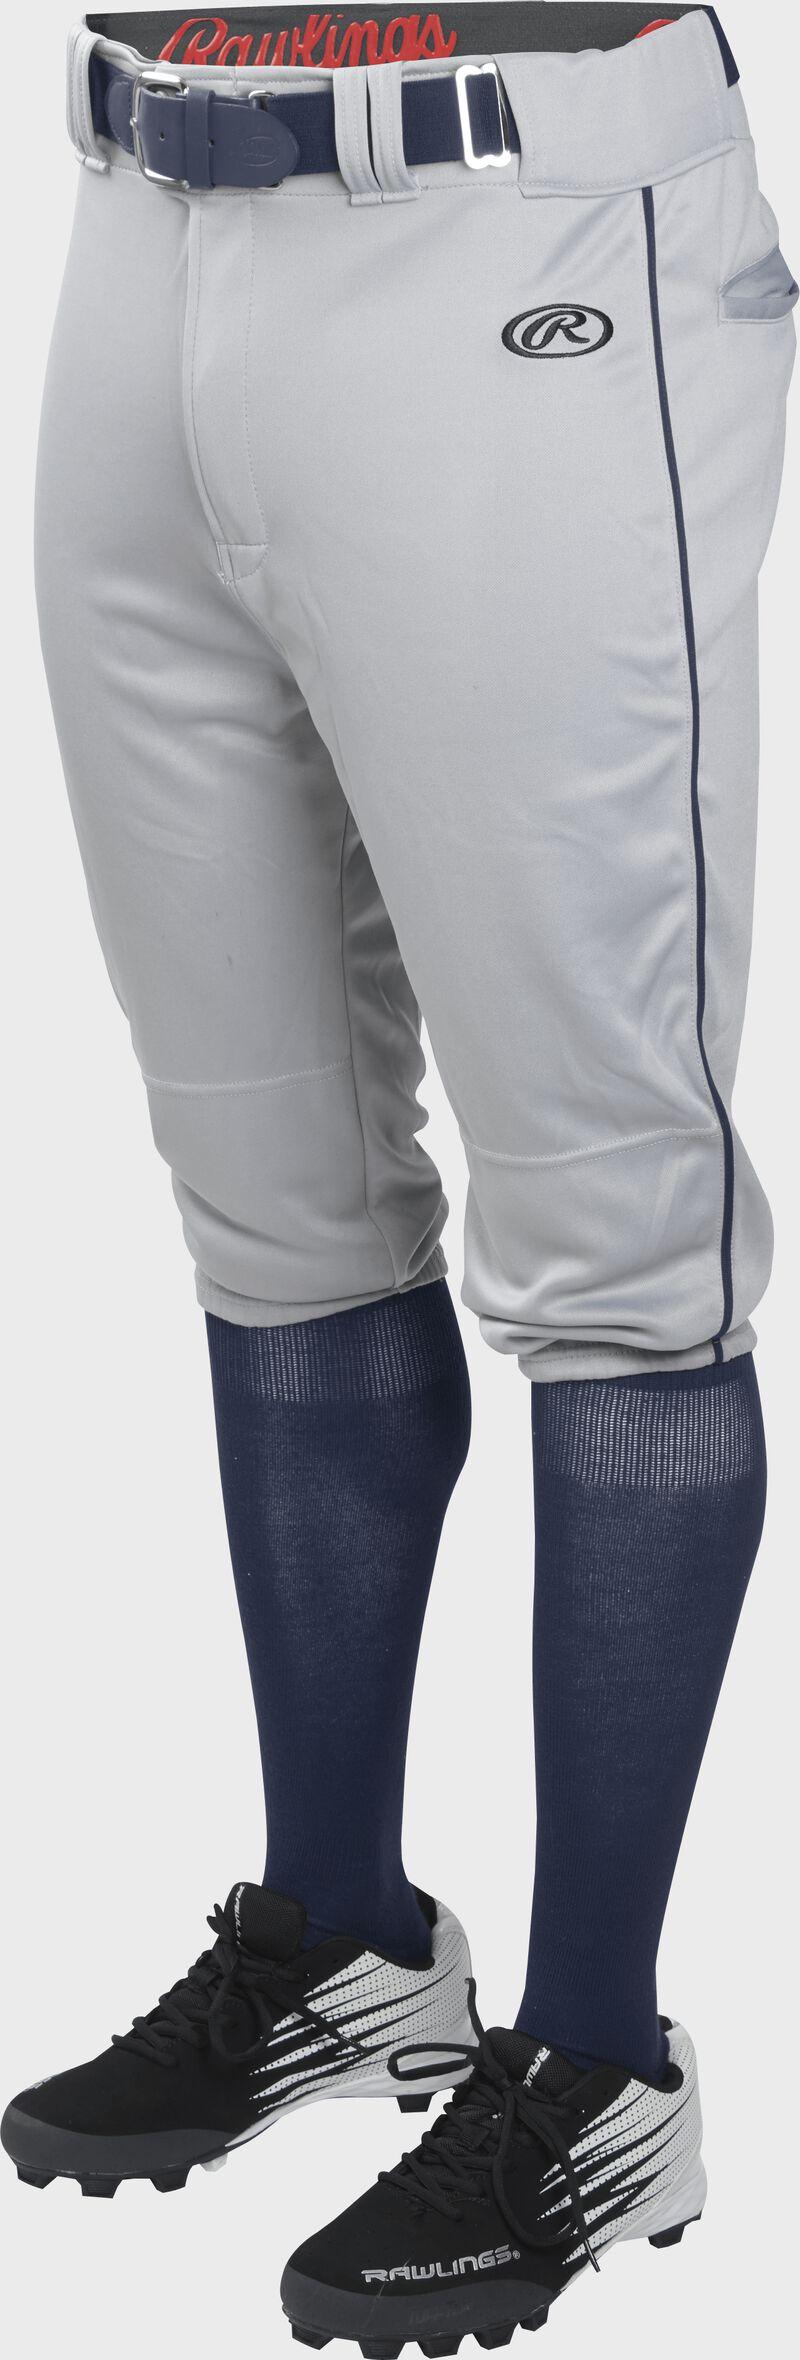 Front of Rawlings Blue Gray/Navy Adult Launch Piped Knicker Baseball Pant - SKU #LNCHKPP-BG/N